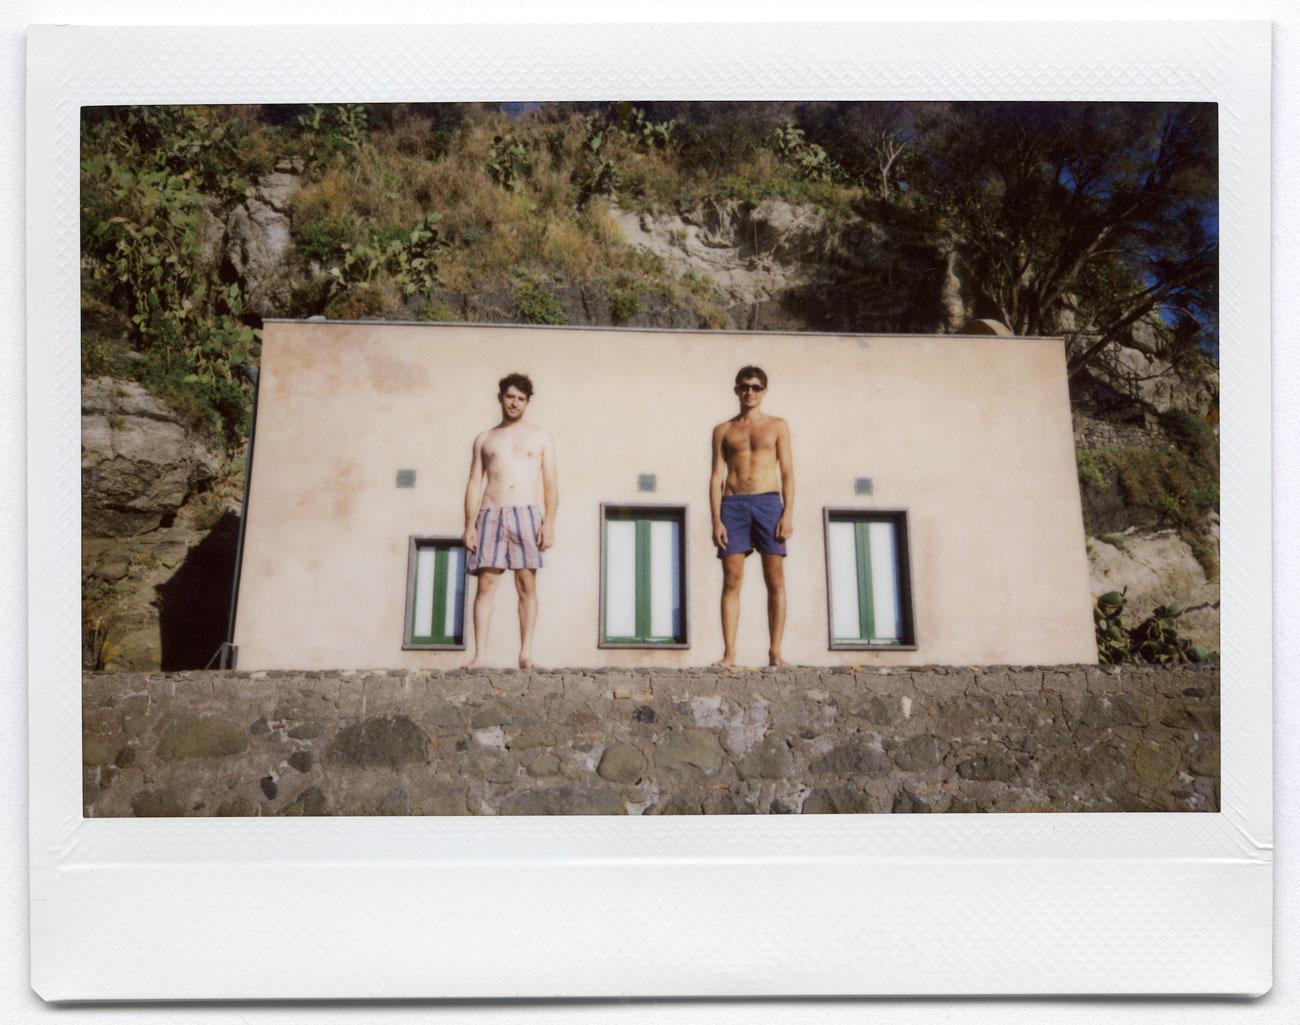 Picture by: Davide Martinazzo